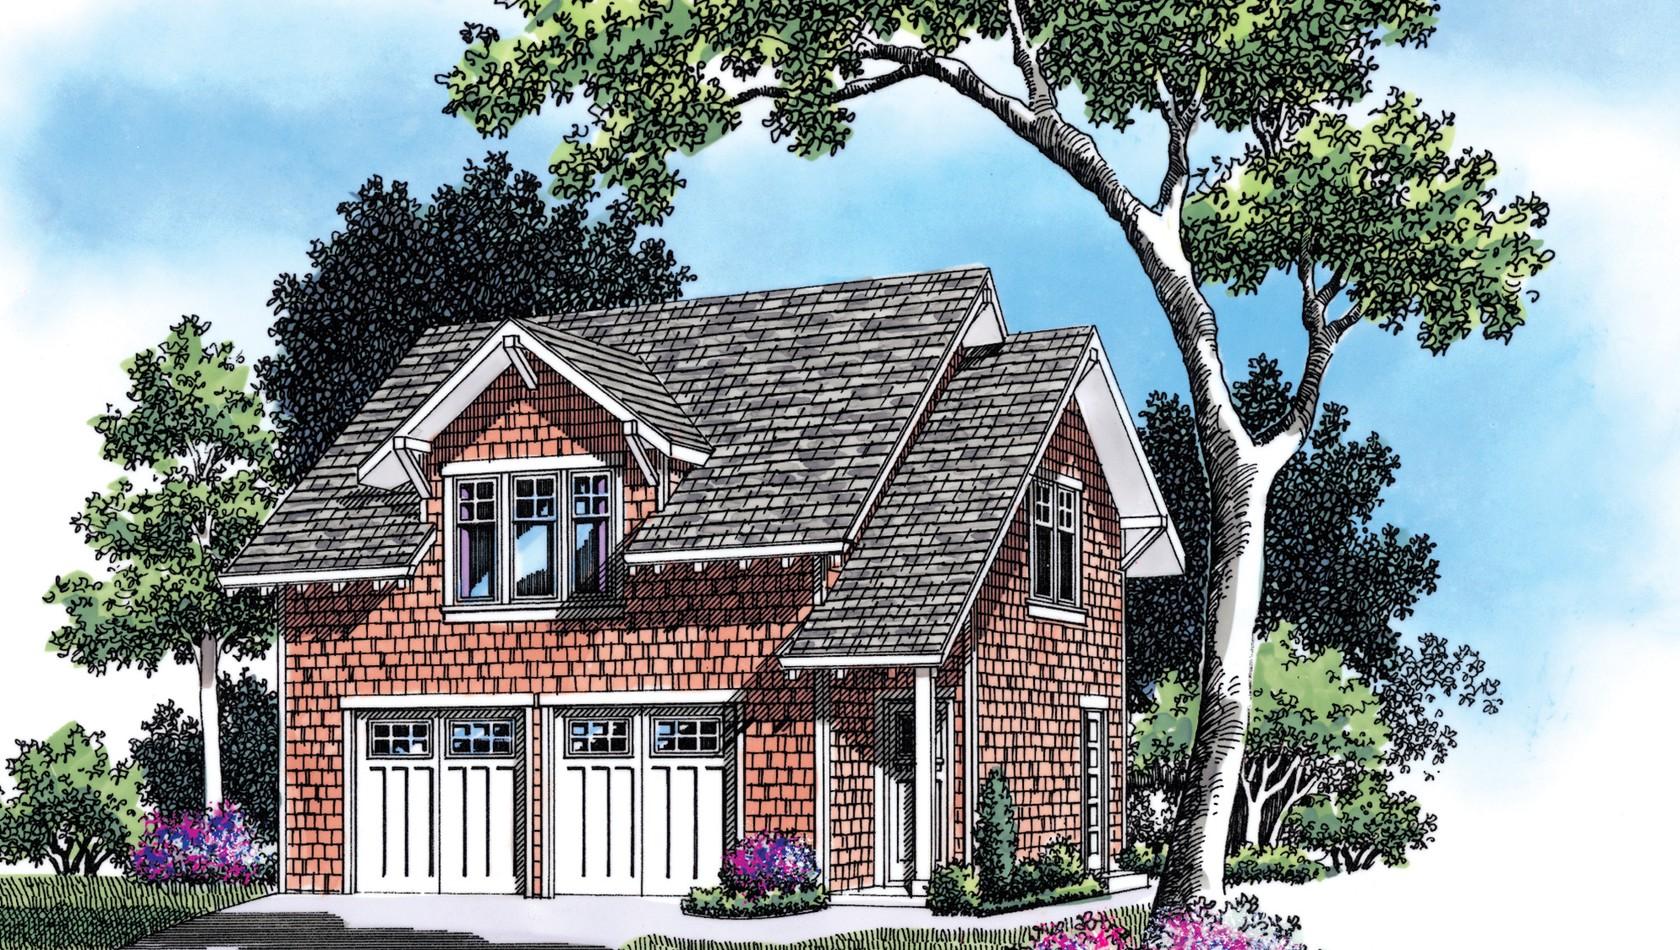 Mascord House Plan 5011: The Arthur